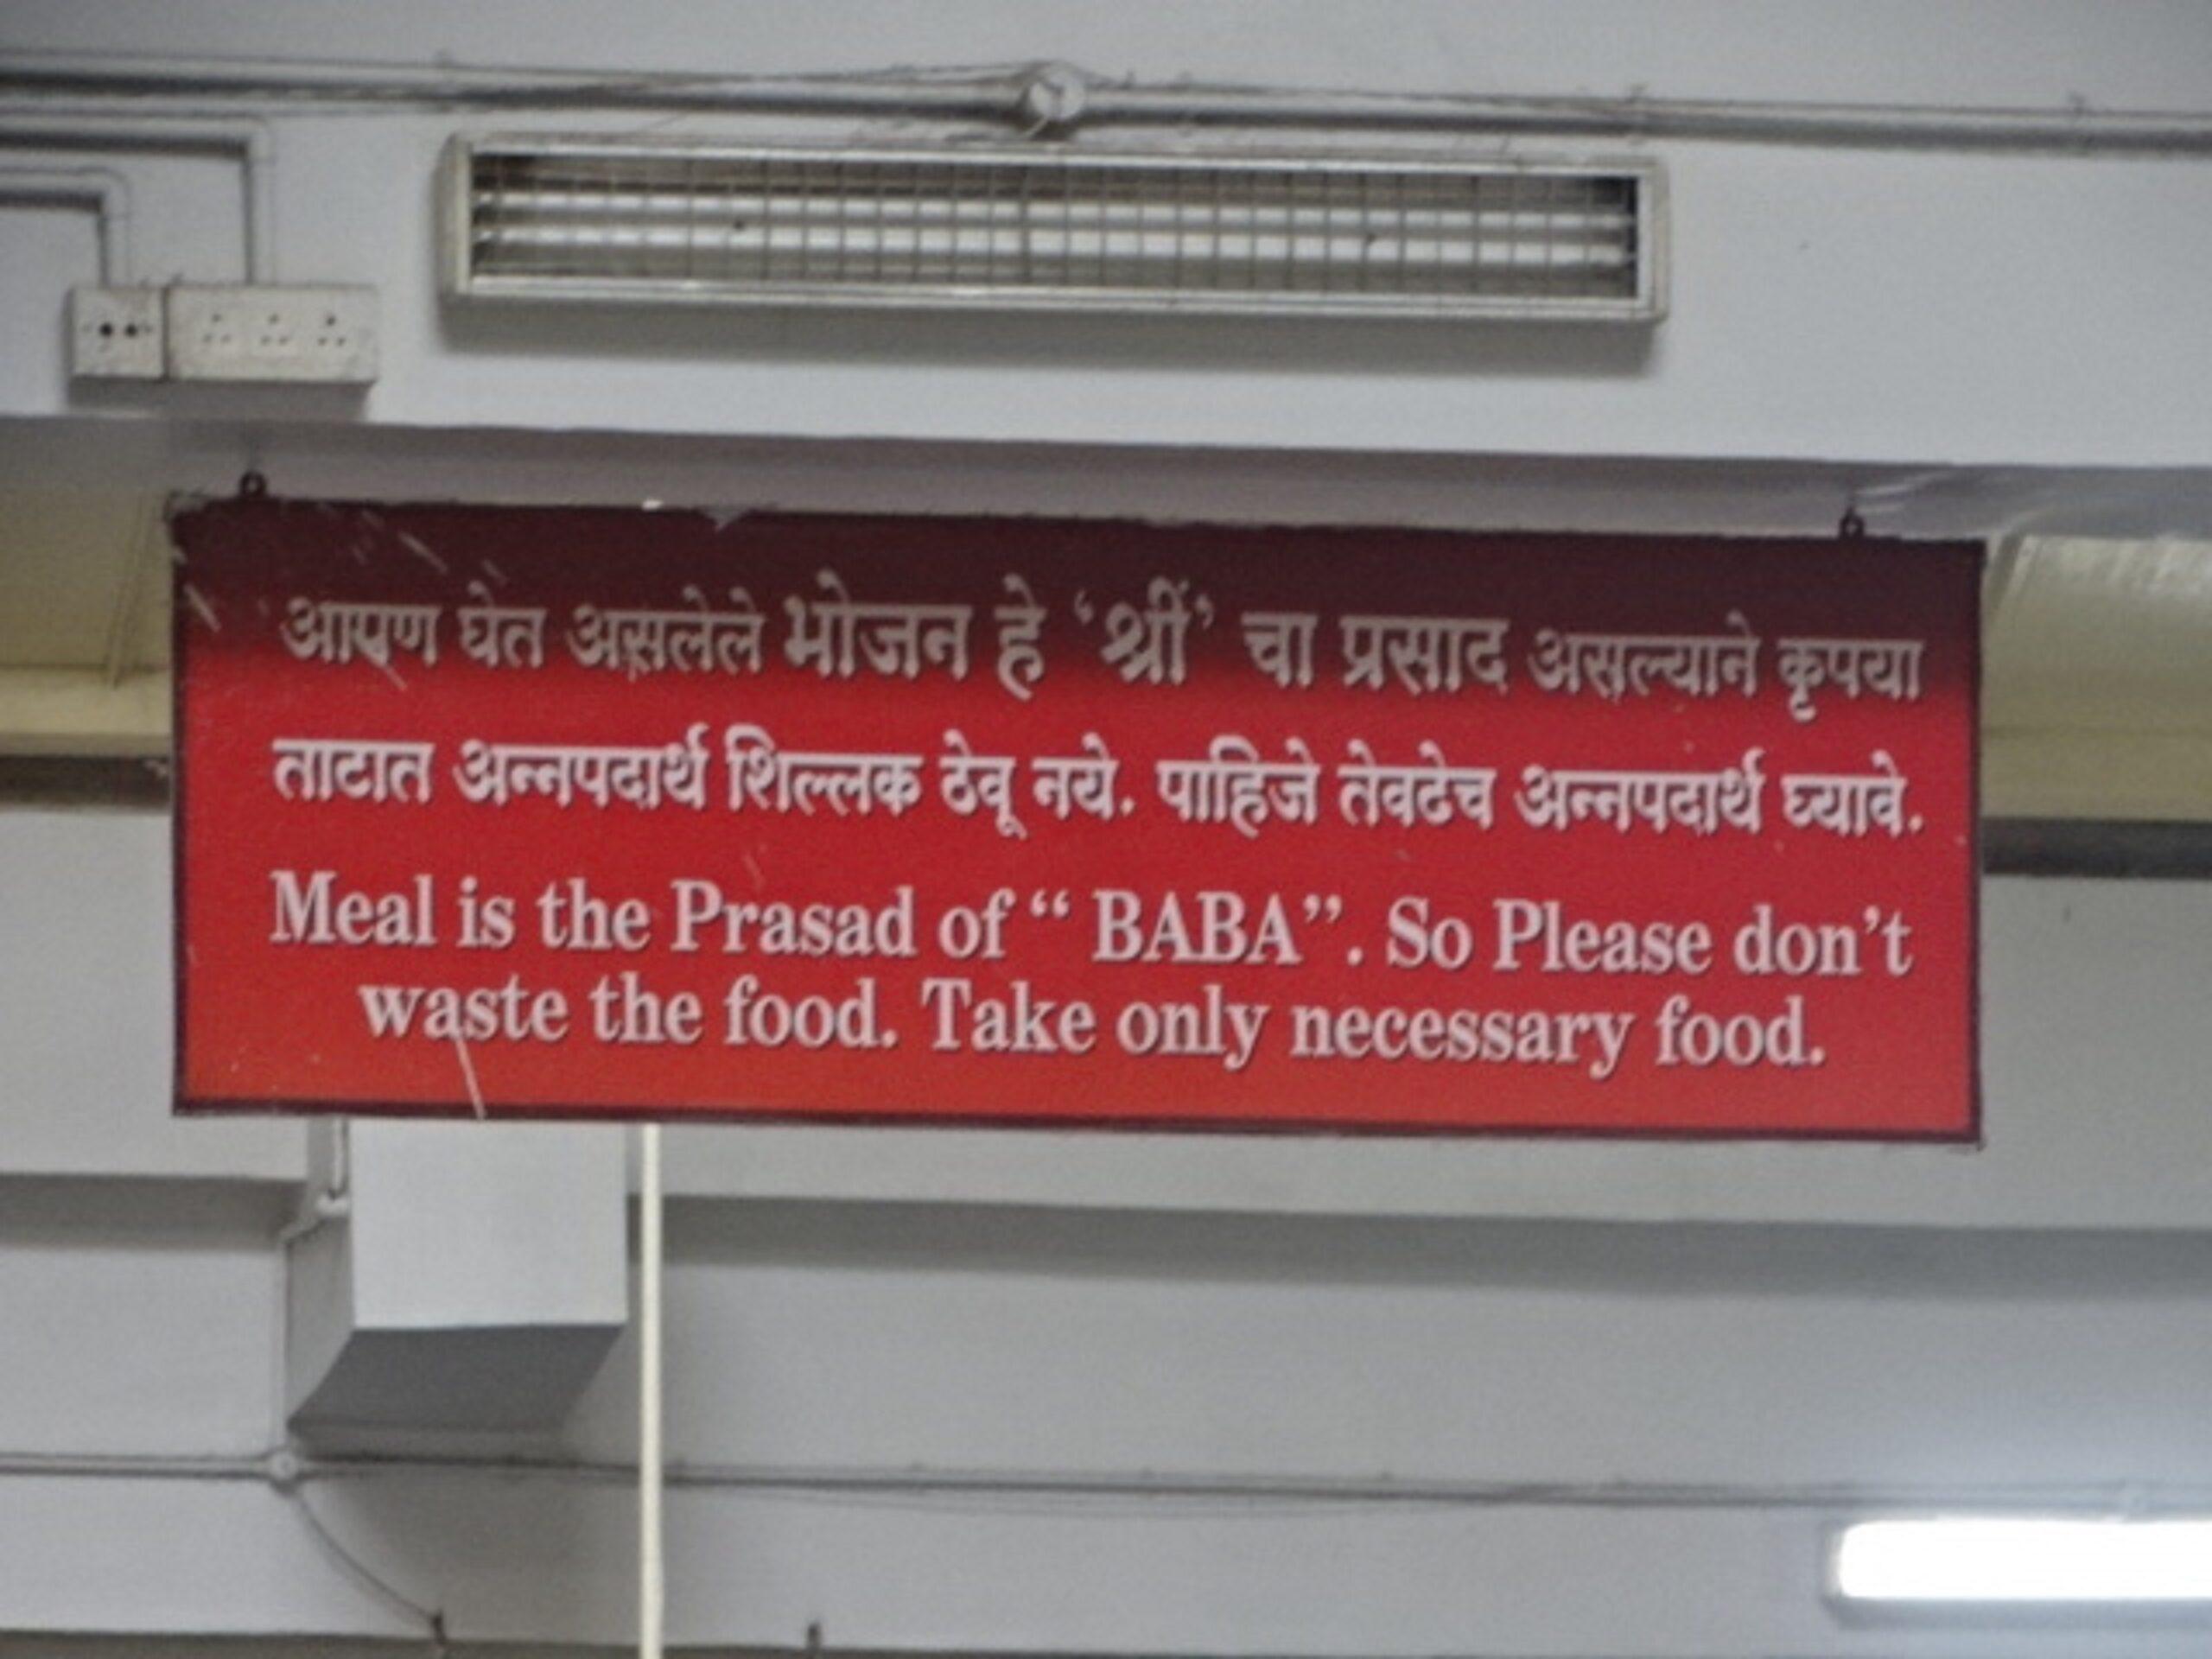 Don't Waste Meal (Prasad) - Notice Board at Shree Sai Prasadalay, Shirdi, Maharashtra, India